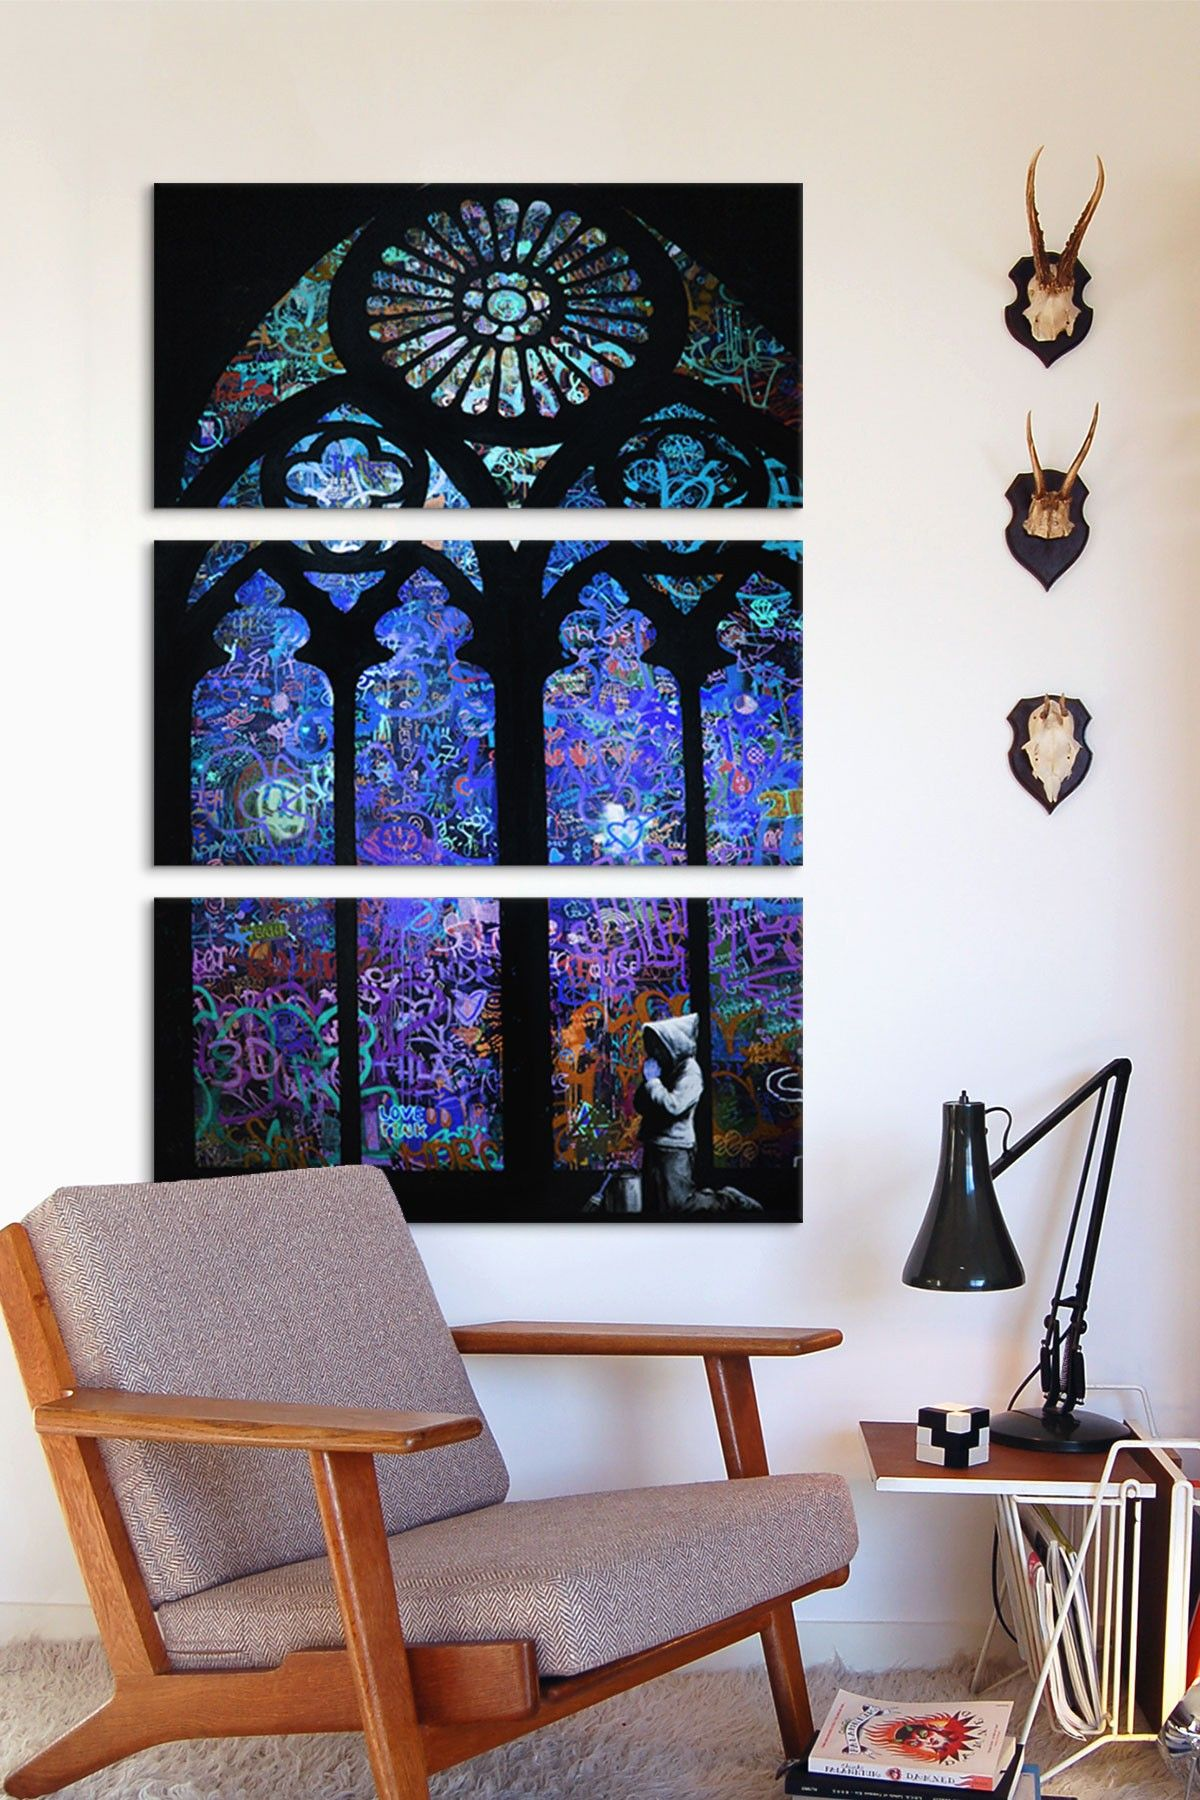 3 window bedroom ideas  stained glass window ii  panel sectional wall art  h o m e